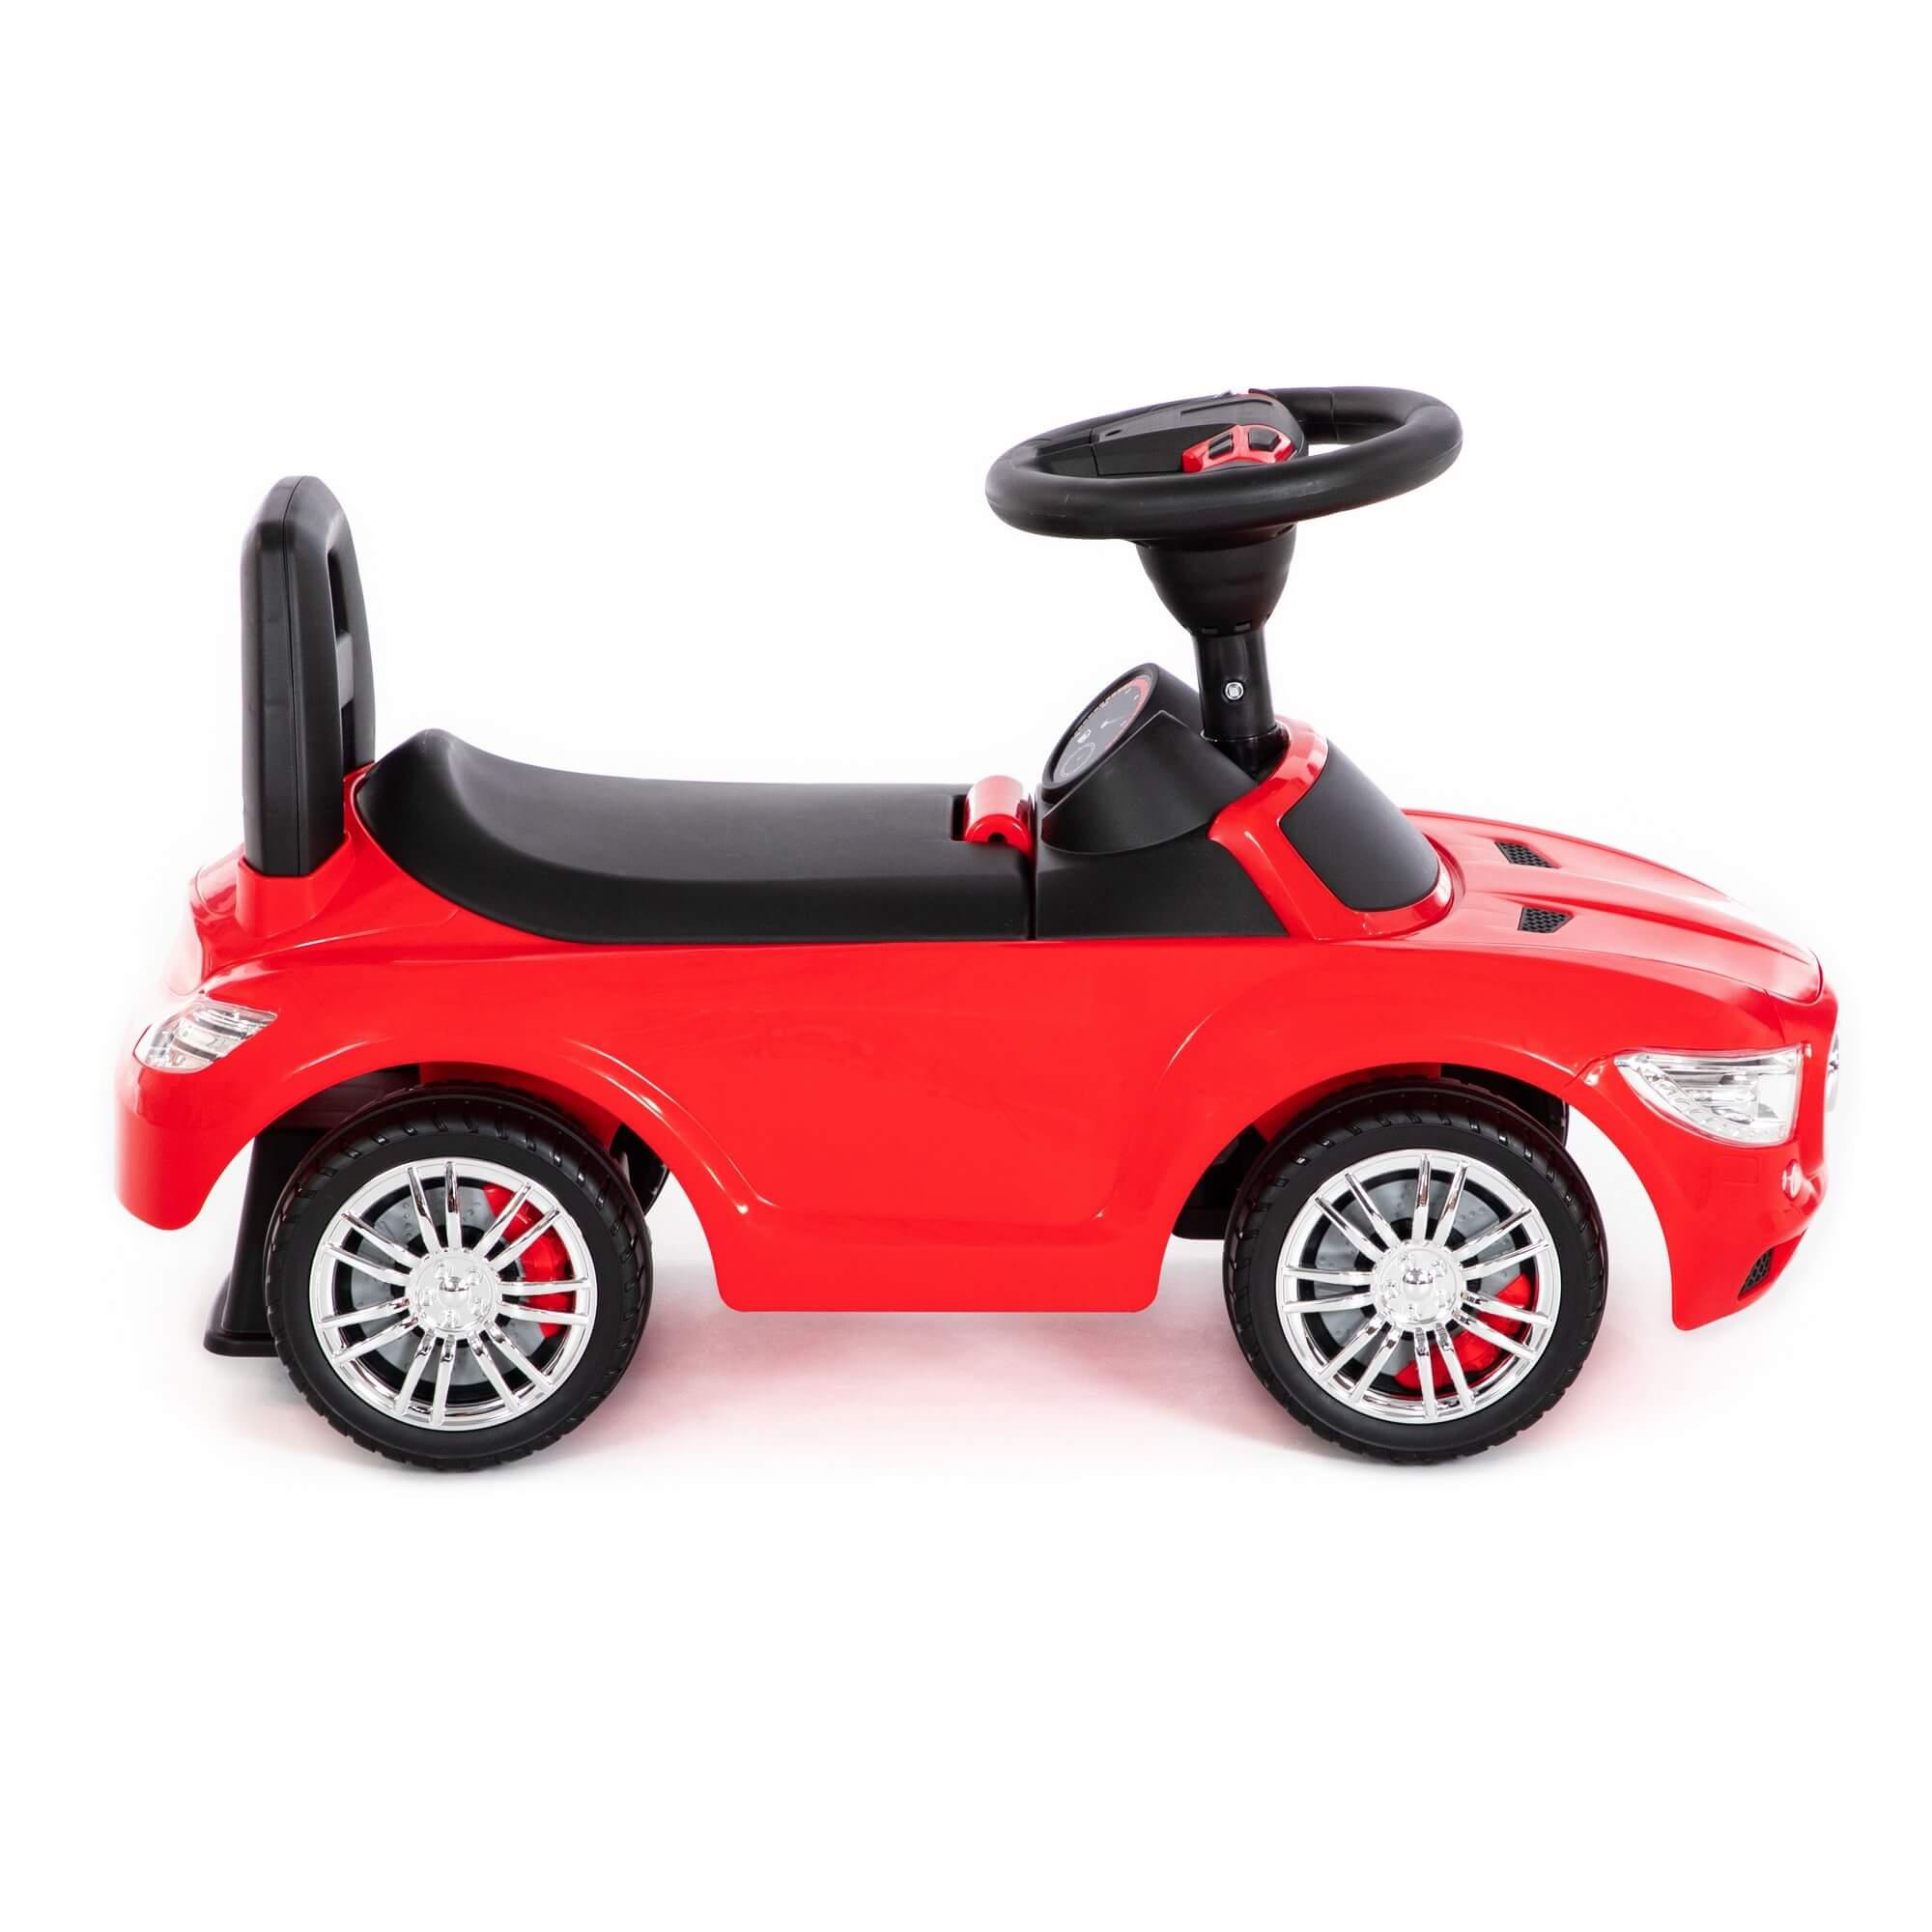 SuperCar sürümeli araba No:1 ses sinyali ile (pembe) Ref. 84460 - photo #5